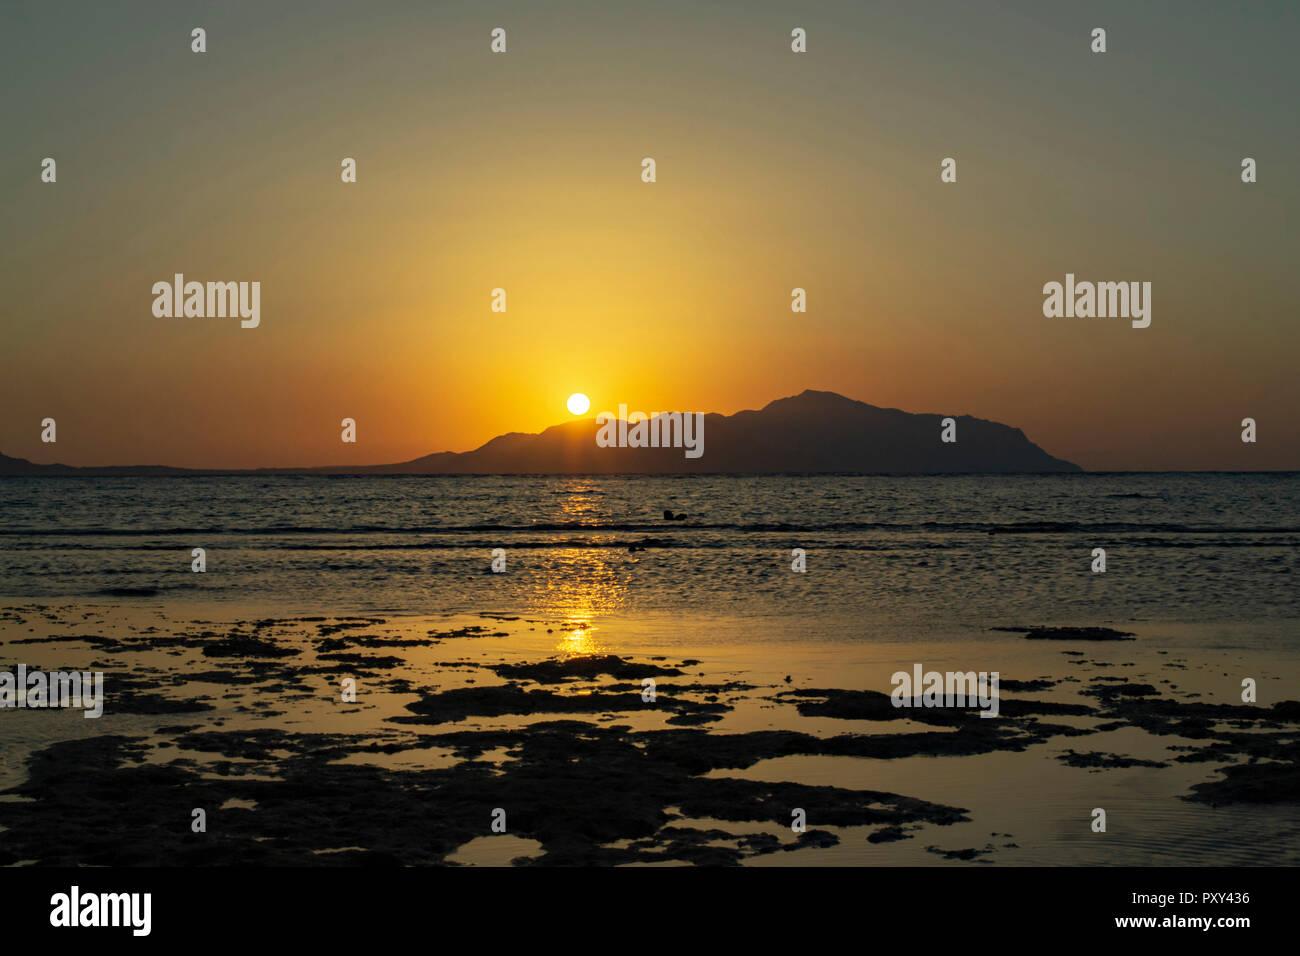 Wundervoller Sonnenaufgang über das Rote Meer und die Insel Tiran Stockbild